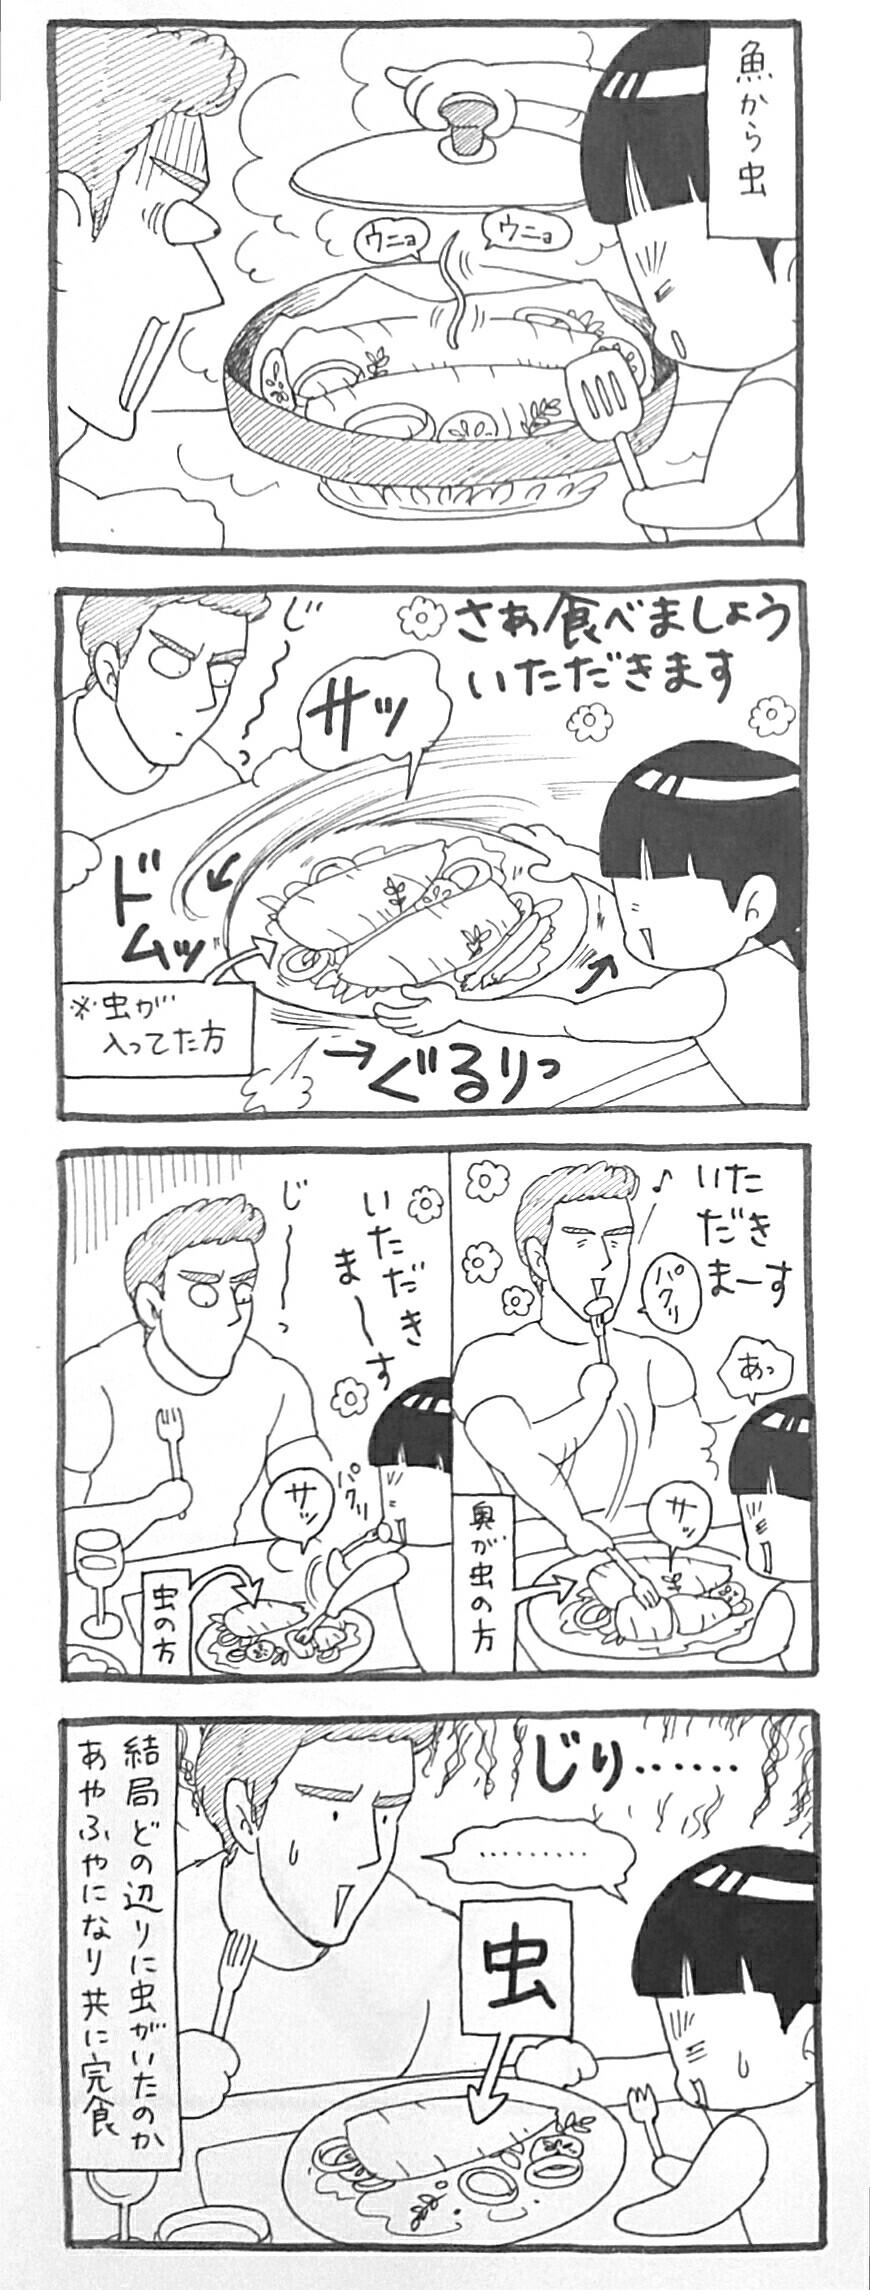 f:id:Shoko_drawing:20190815221748j:plain